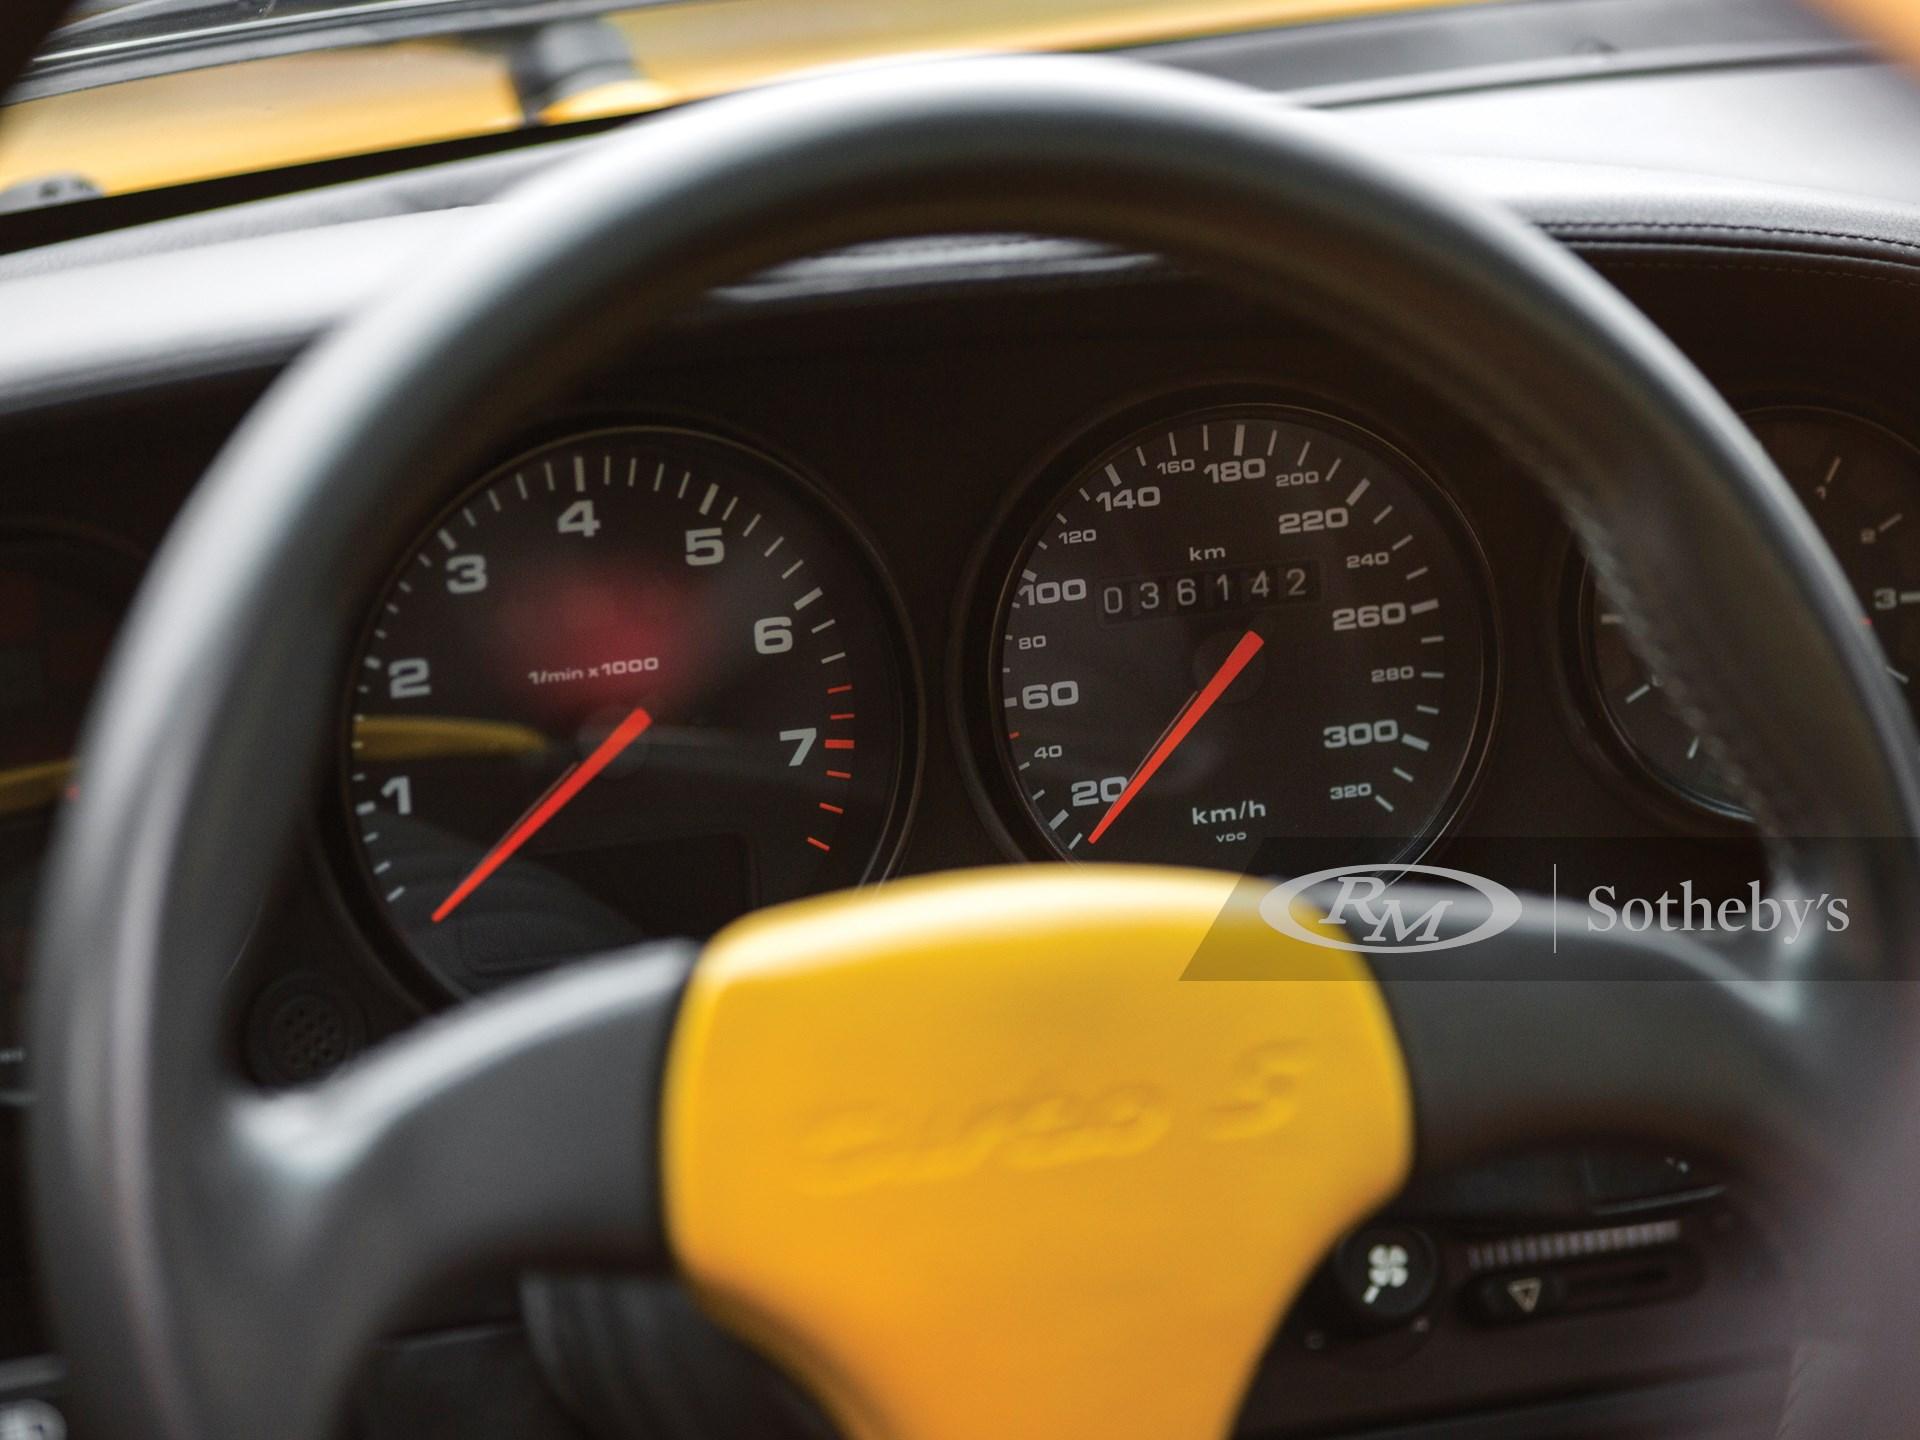 1993 Porsche 911 Turbo S 'Leichtbau'  -